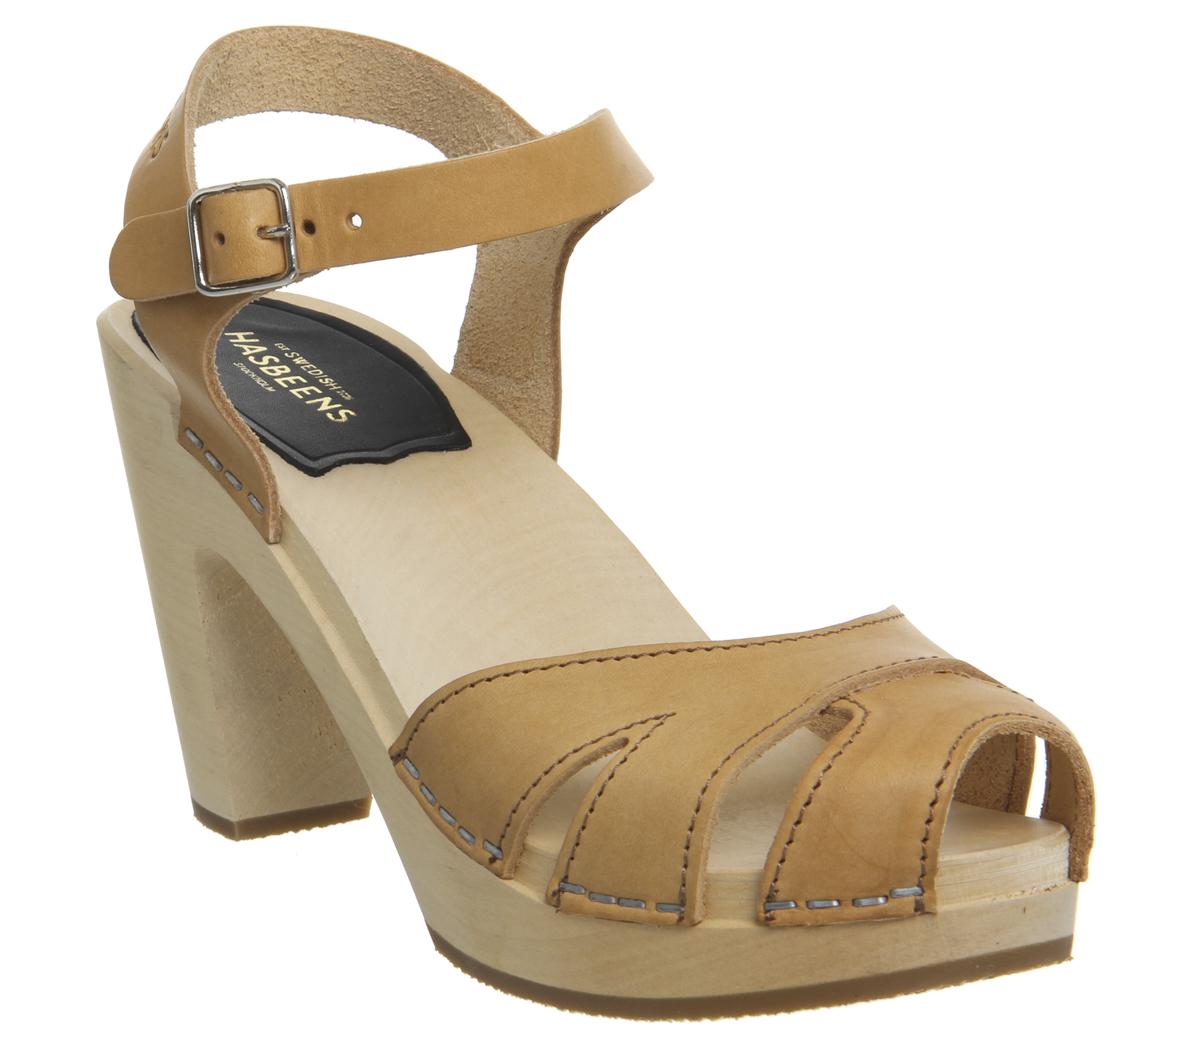 Womens Swedish Hasbeens Suzanne Hi Peep Toe Sandals NATURE Sandals